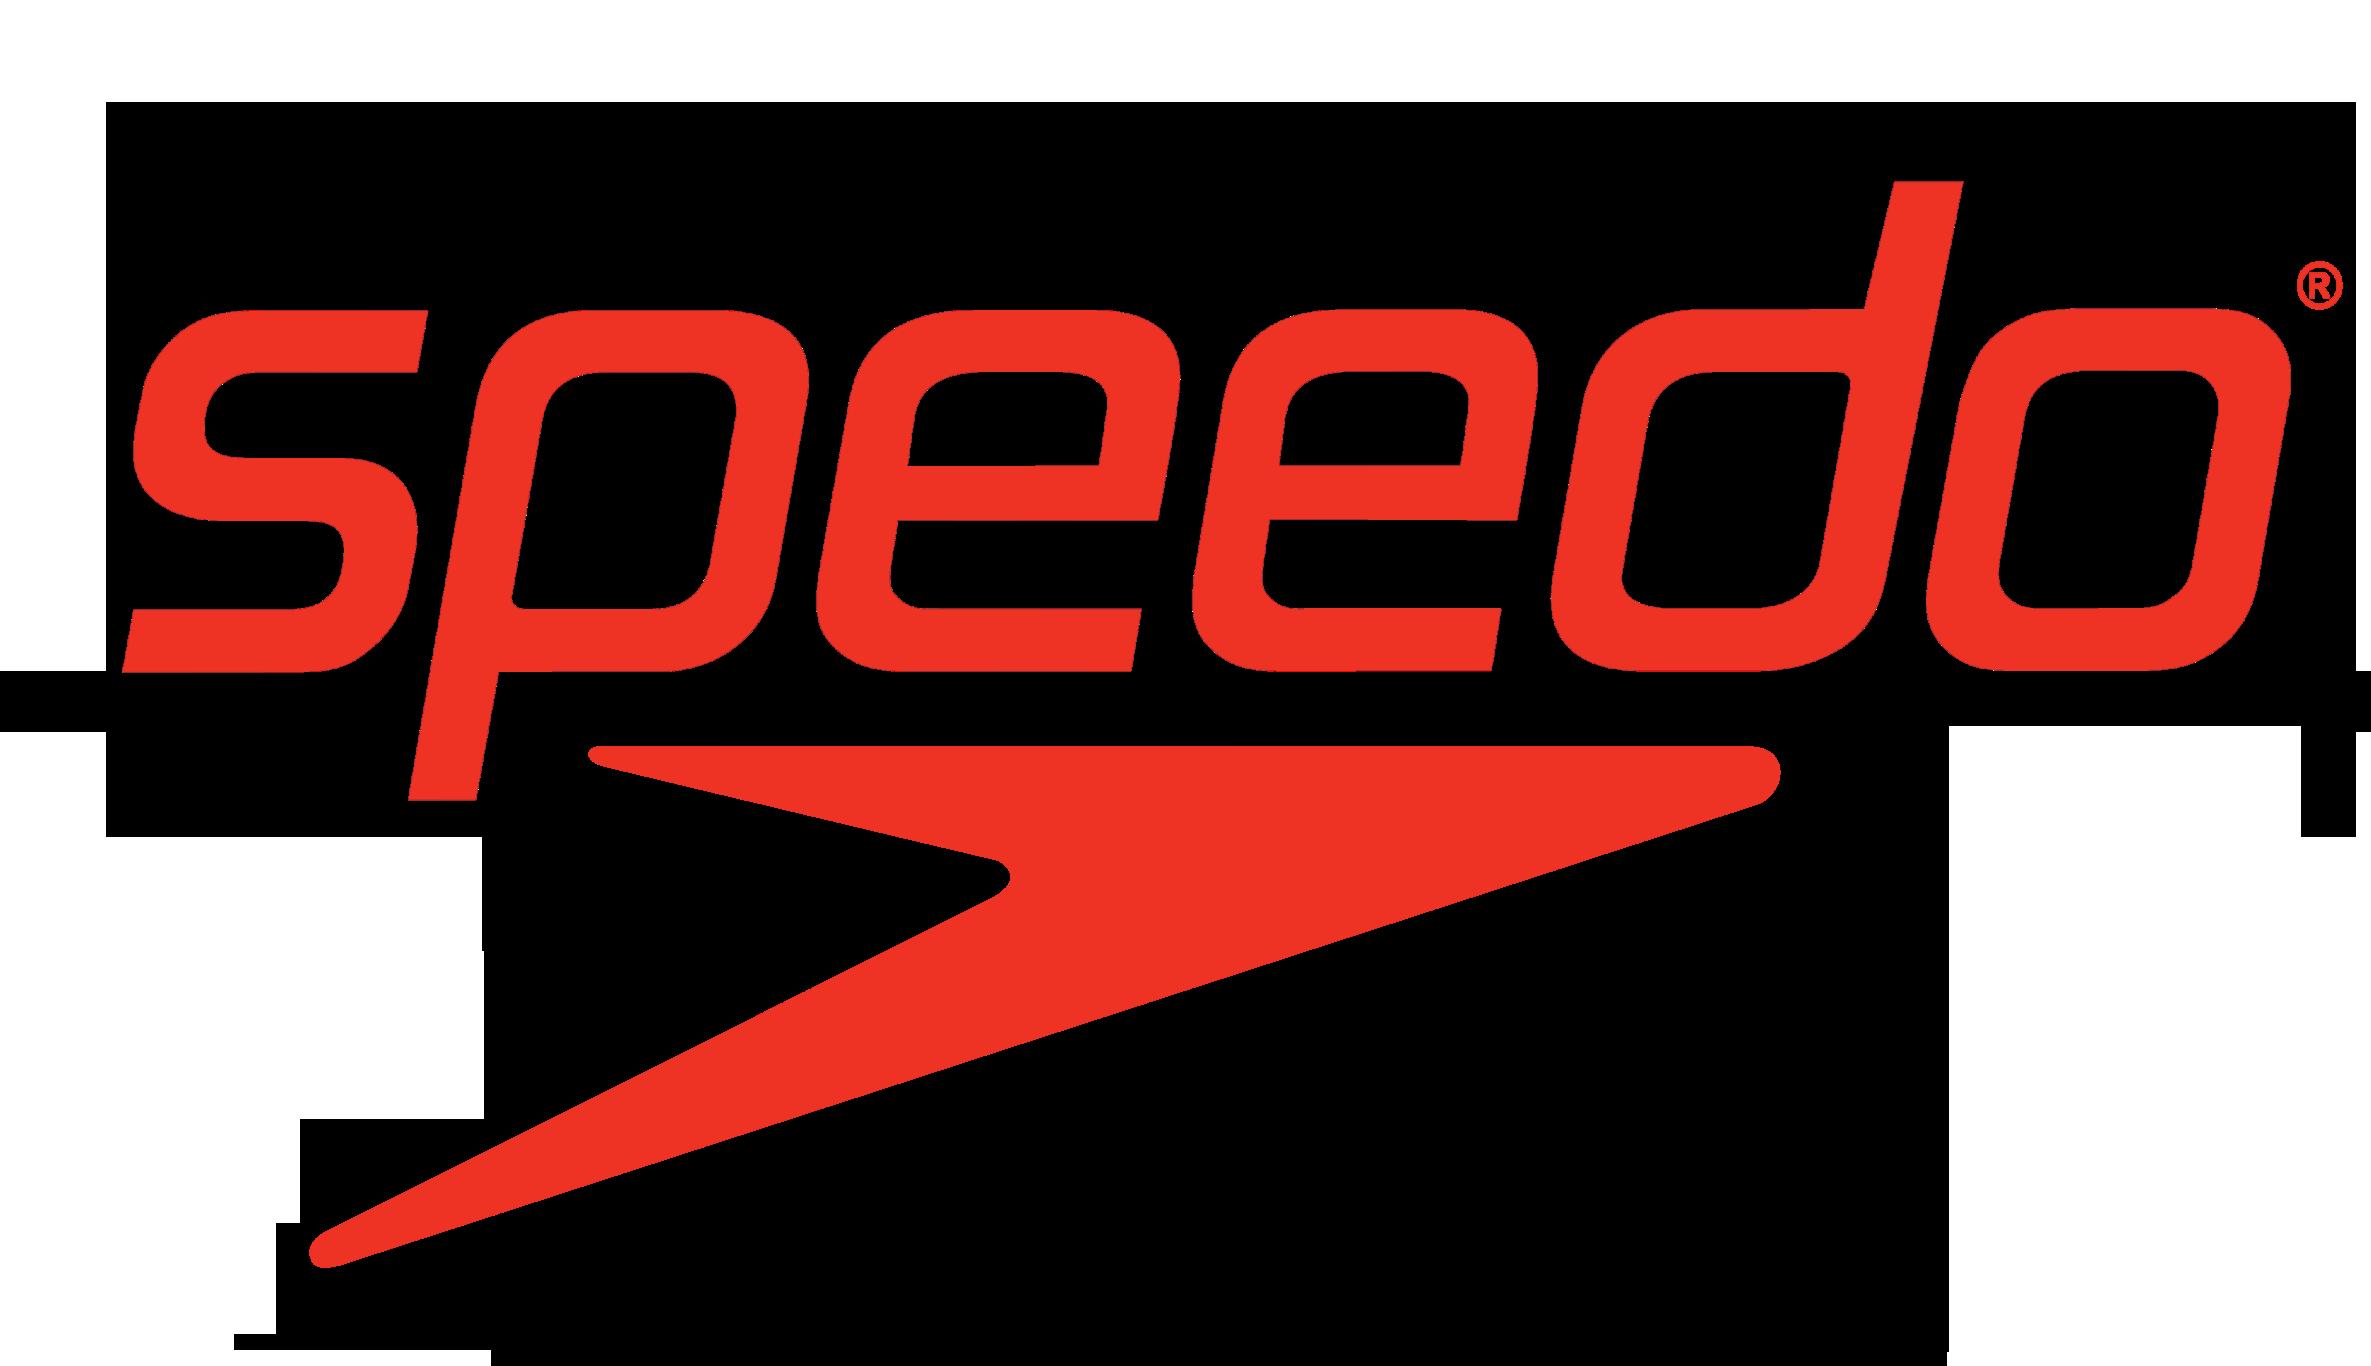 Speedo Logos Download